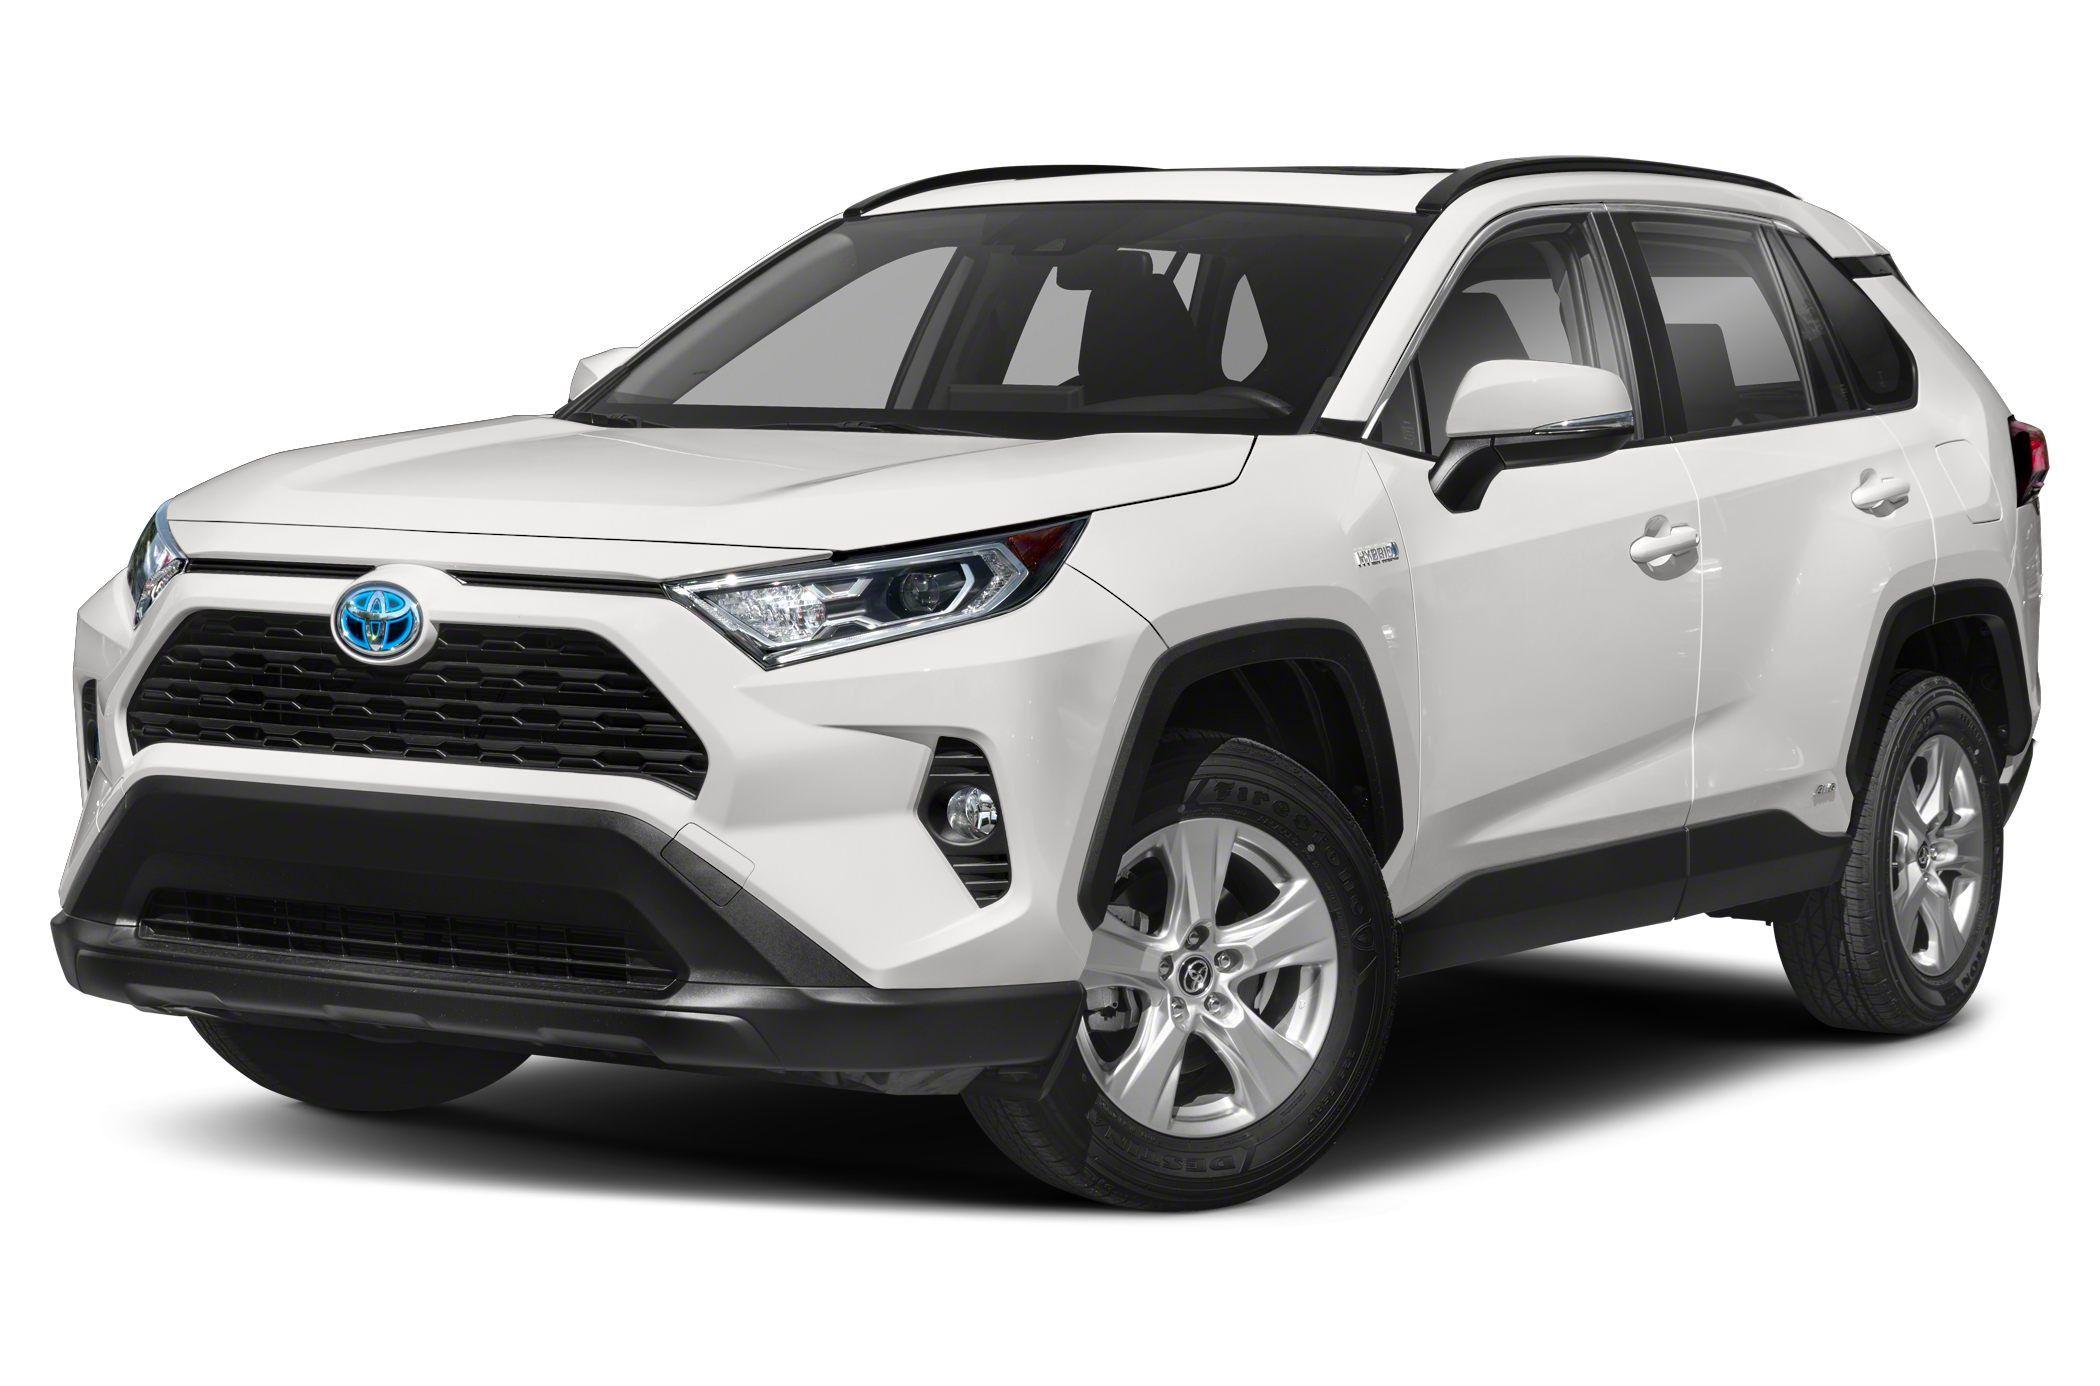 2019 Toyota Rav4 Hybrid Check More At Http Www Best Cars Club 2018 05 17 2019 Toyota Rav4 Hybrid